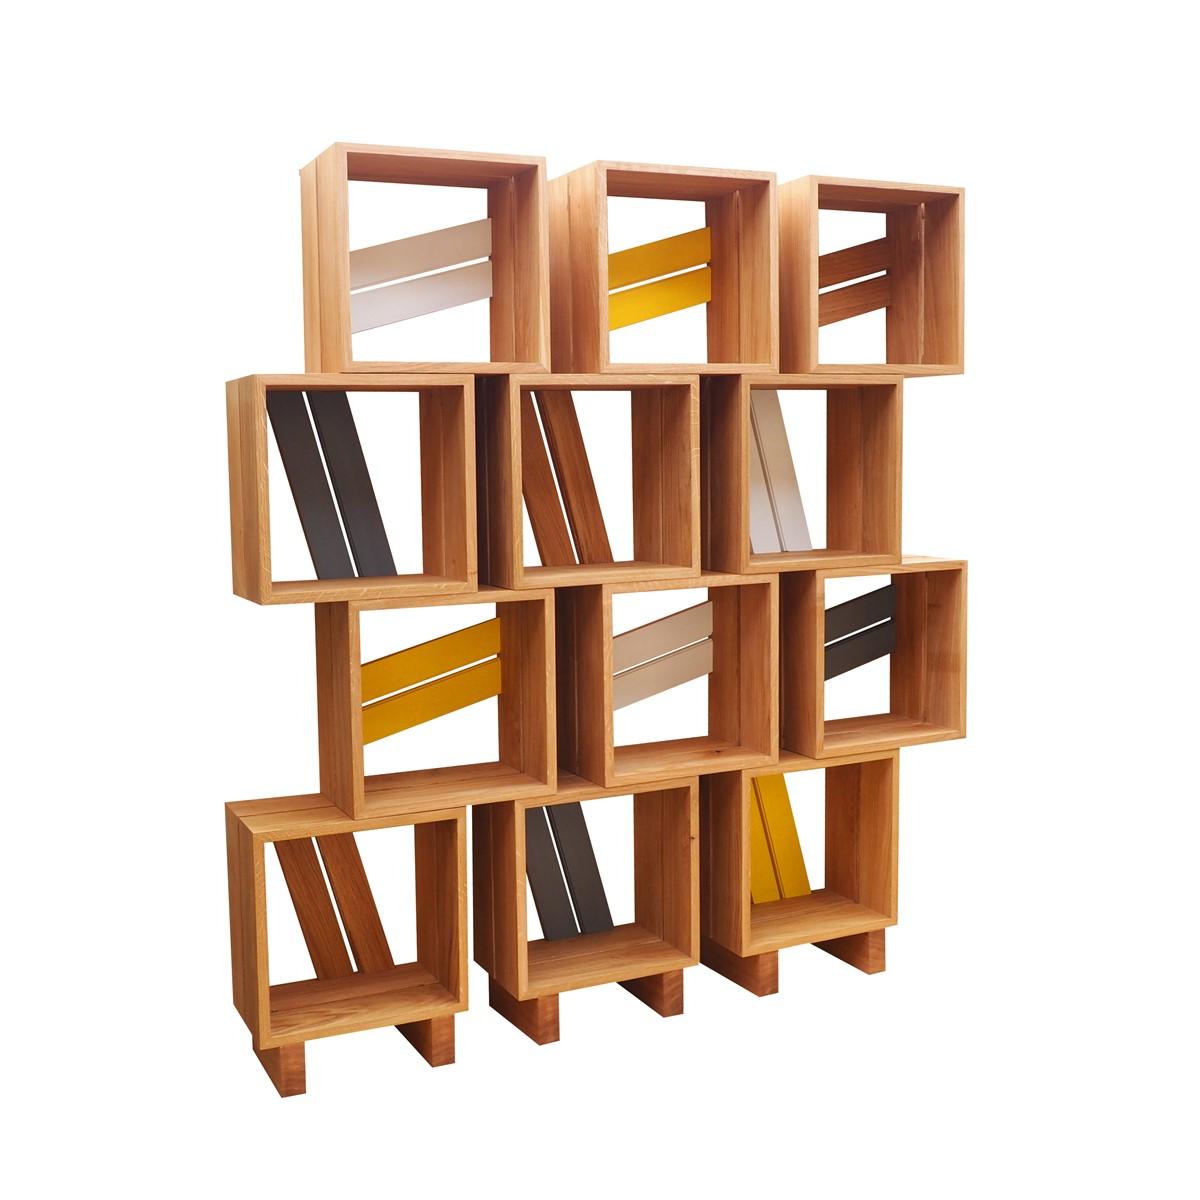 Meuble biblioth que modulable 12 casiers bois jaune gris blanc atelier mobi - Bibliotheque meuble modulable ...